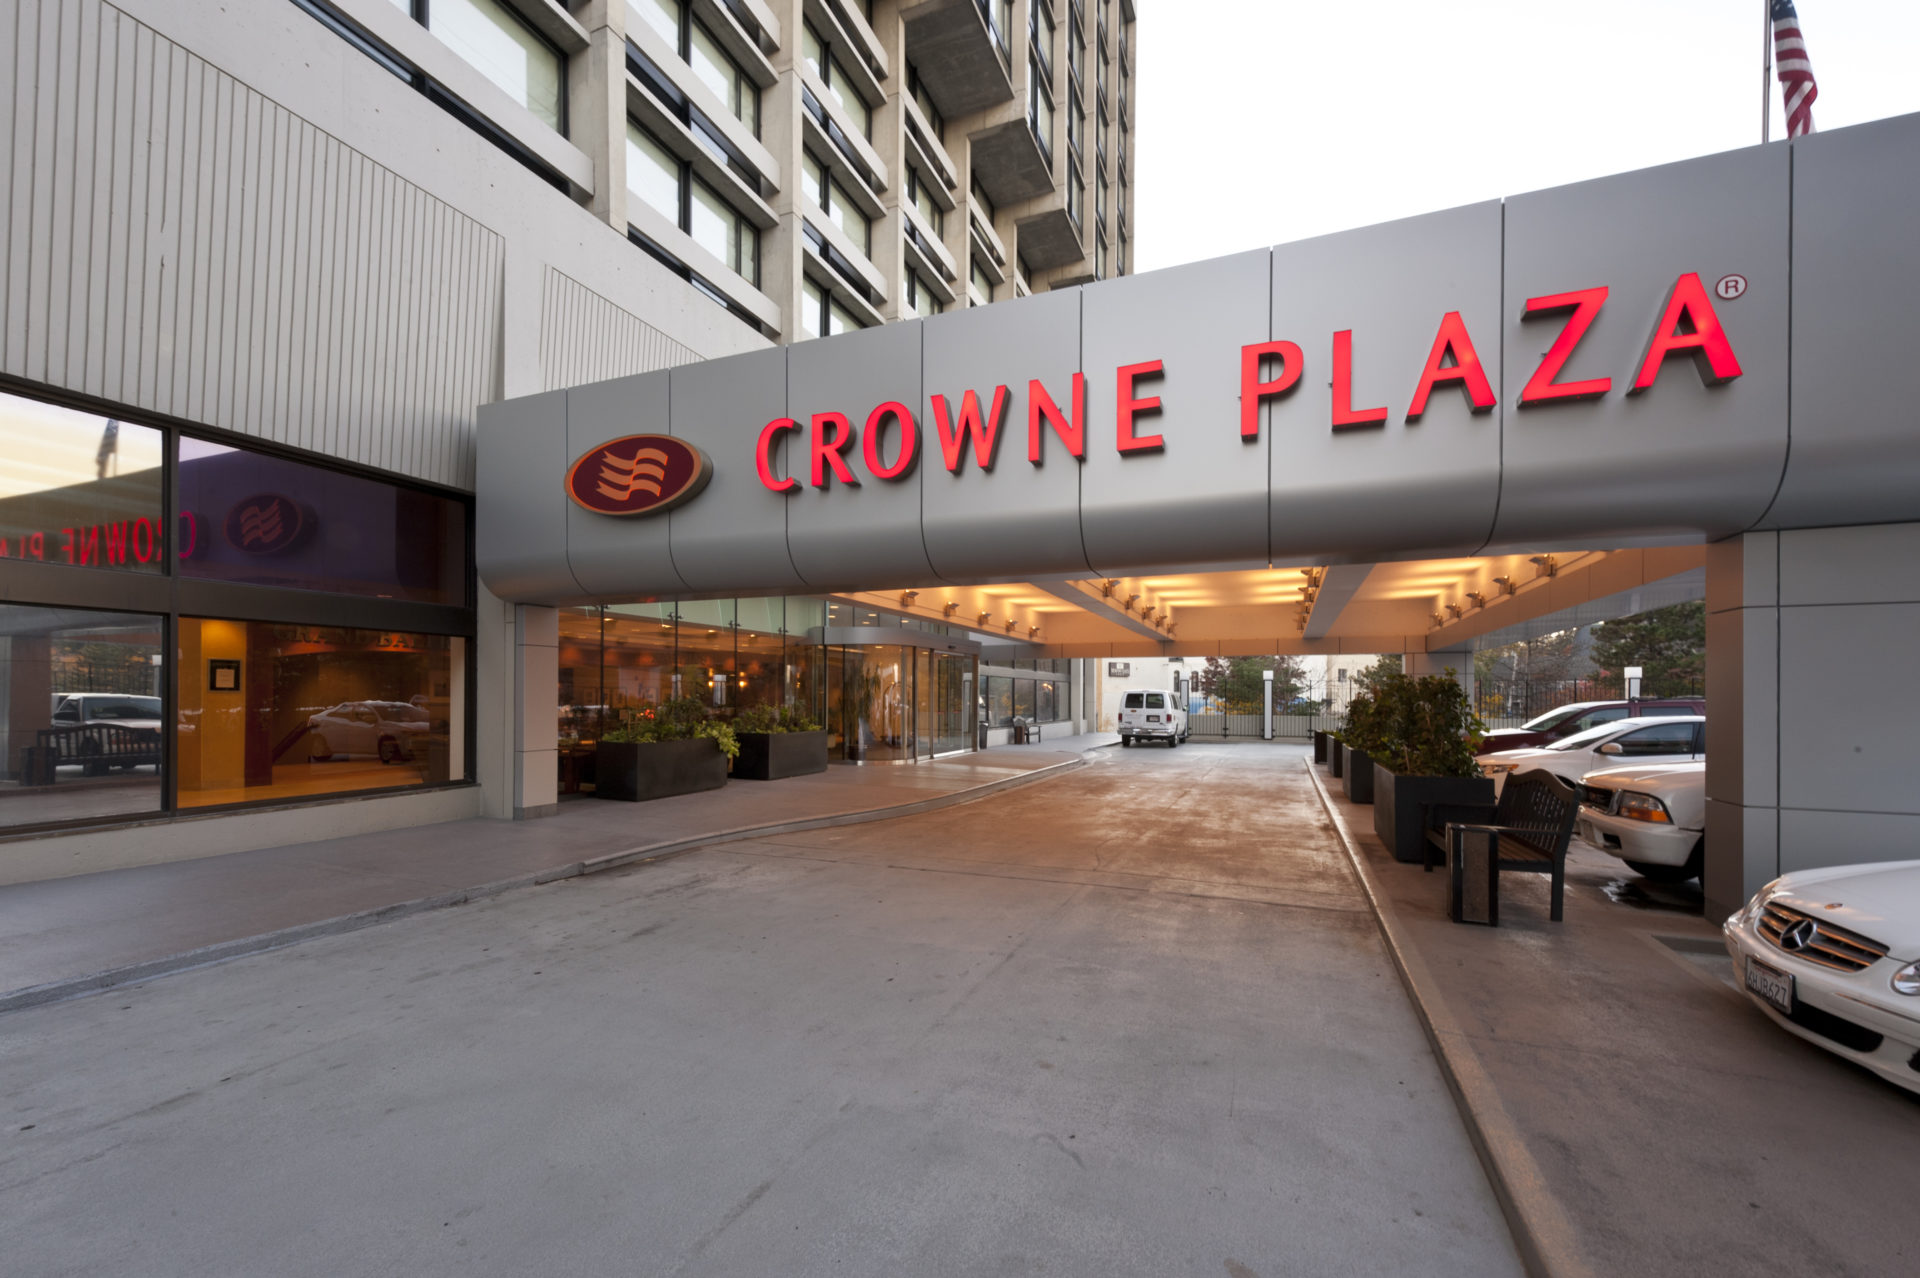 Crowne Plaza Hotel Chapman Construction